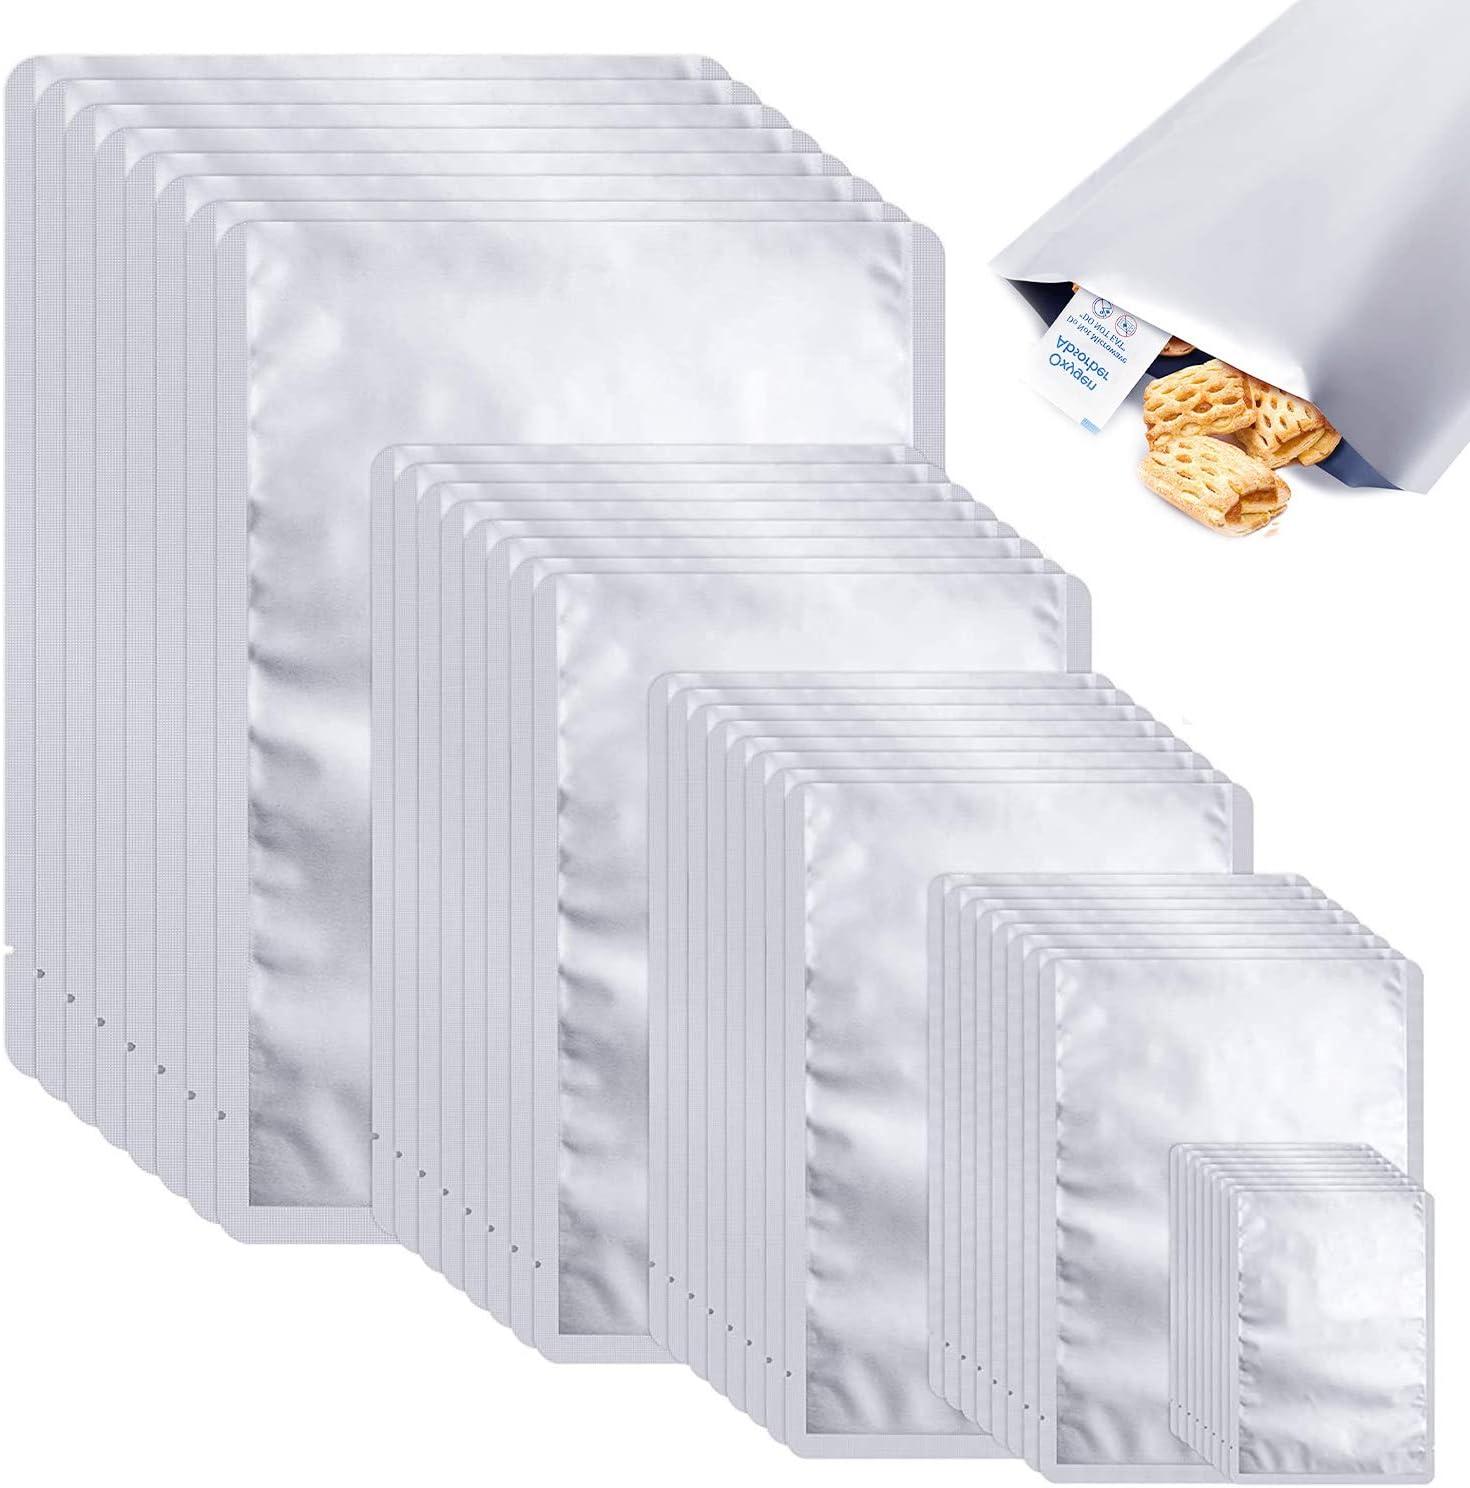 40PCS Mylar Aluminum Foil Bags,5 Sizes Mylar Bags Silver Small Sample Mylar Bags for food storage Metallic Mylar Foil Flat Heat Sealing Bags Mylar Storage Bags Pouch Long Term Food Storage Vacuum